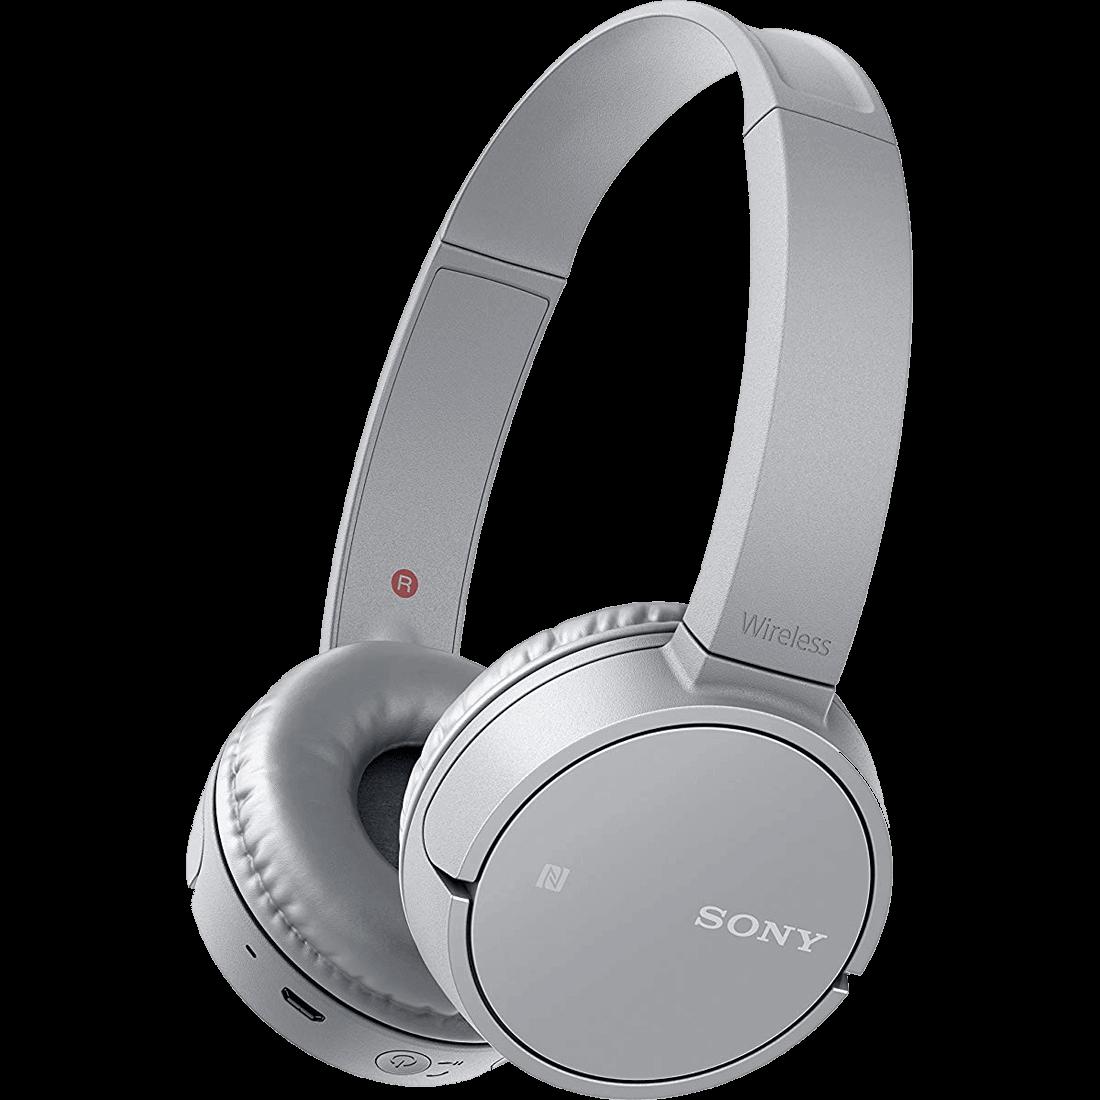 Sony WH-CH500 Bluetooth-Kopfhörer